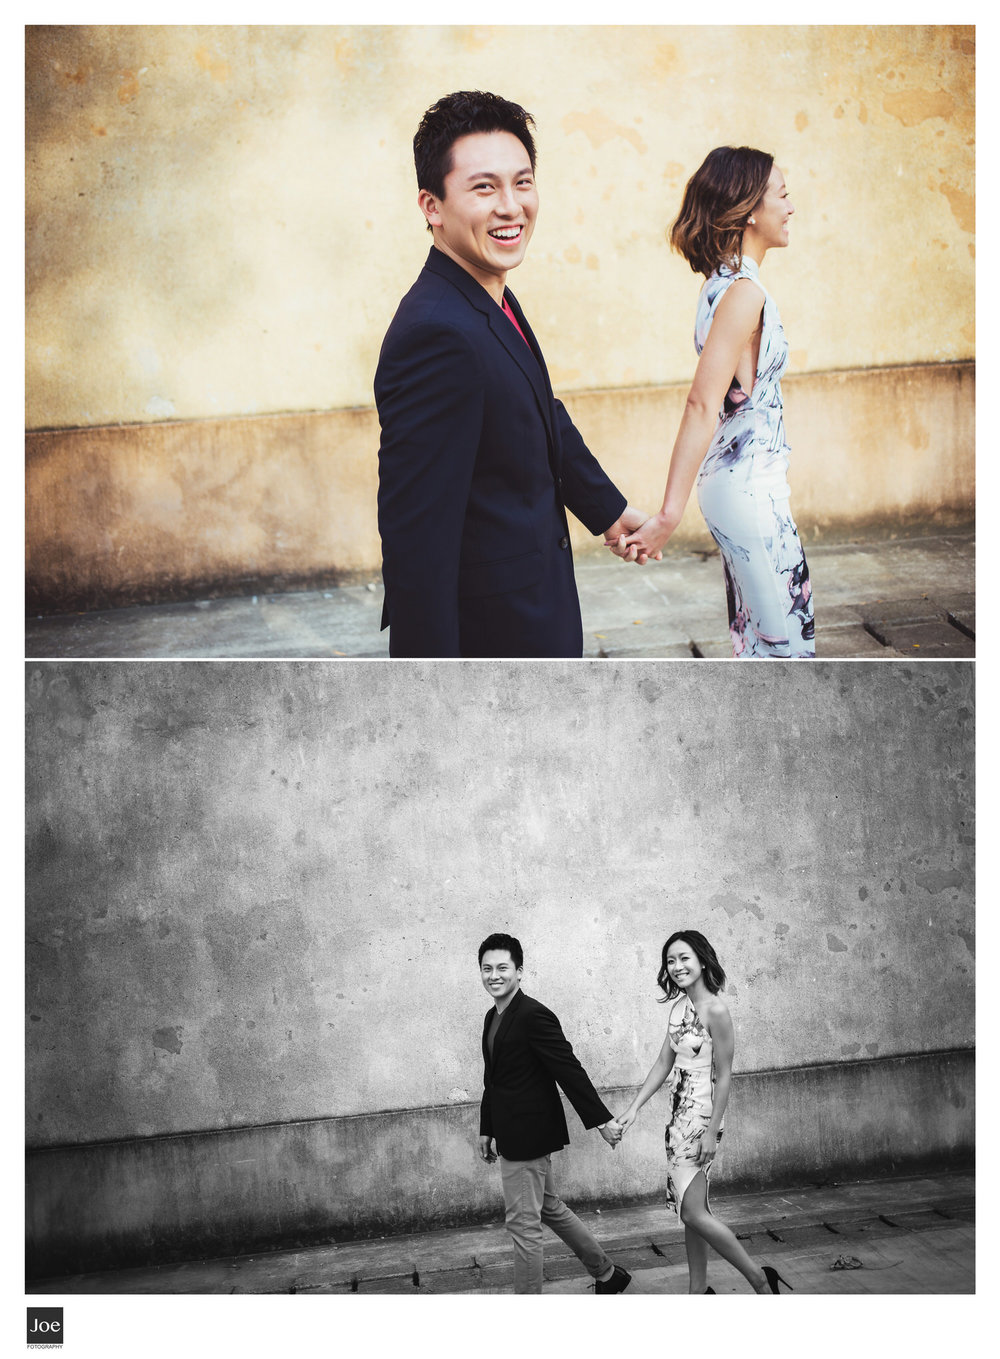 joefotography-taiwan-pre-wedding-annie-aaron-37.jpg